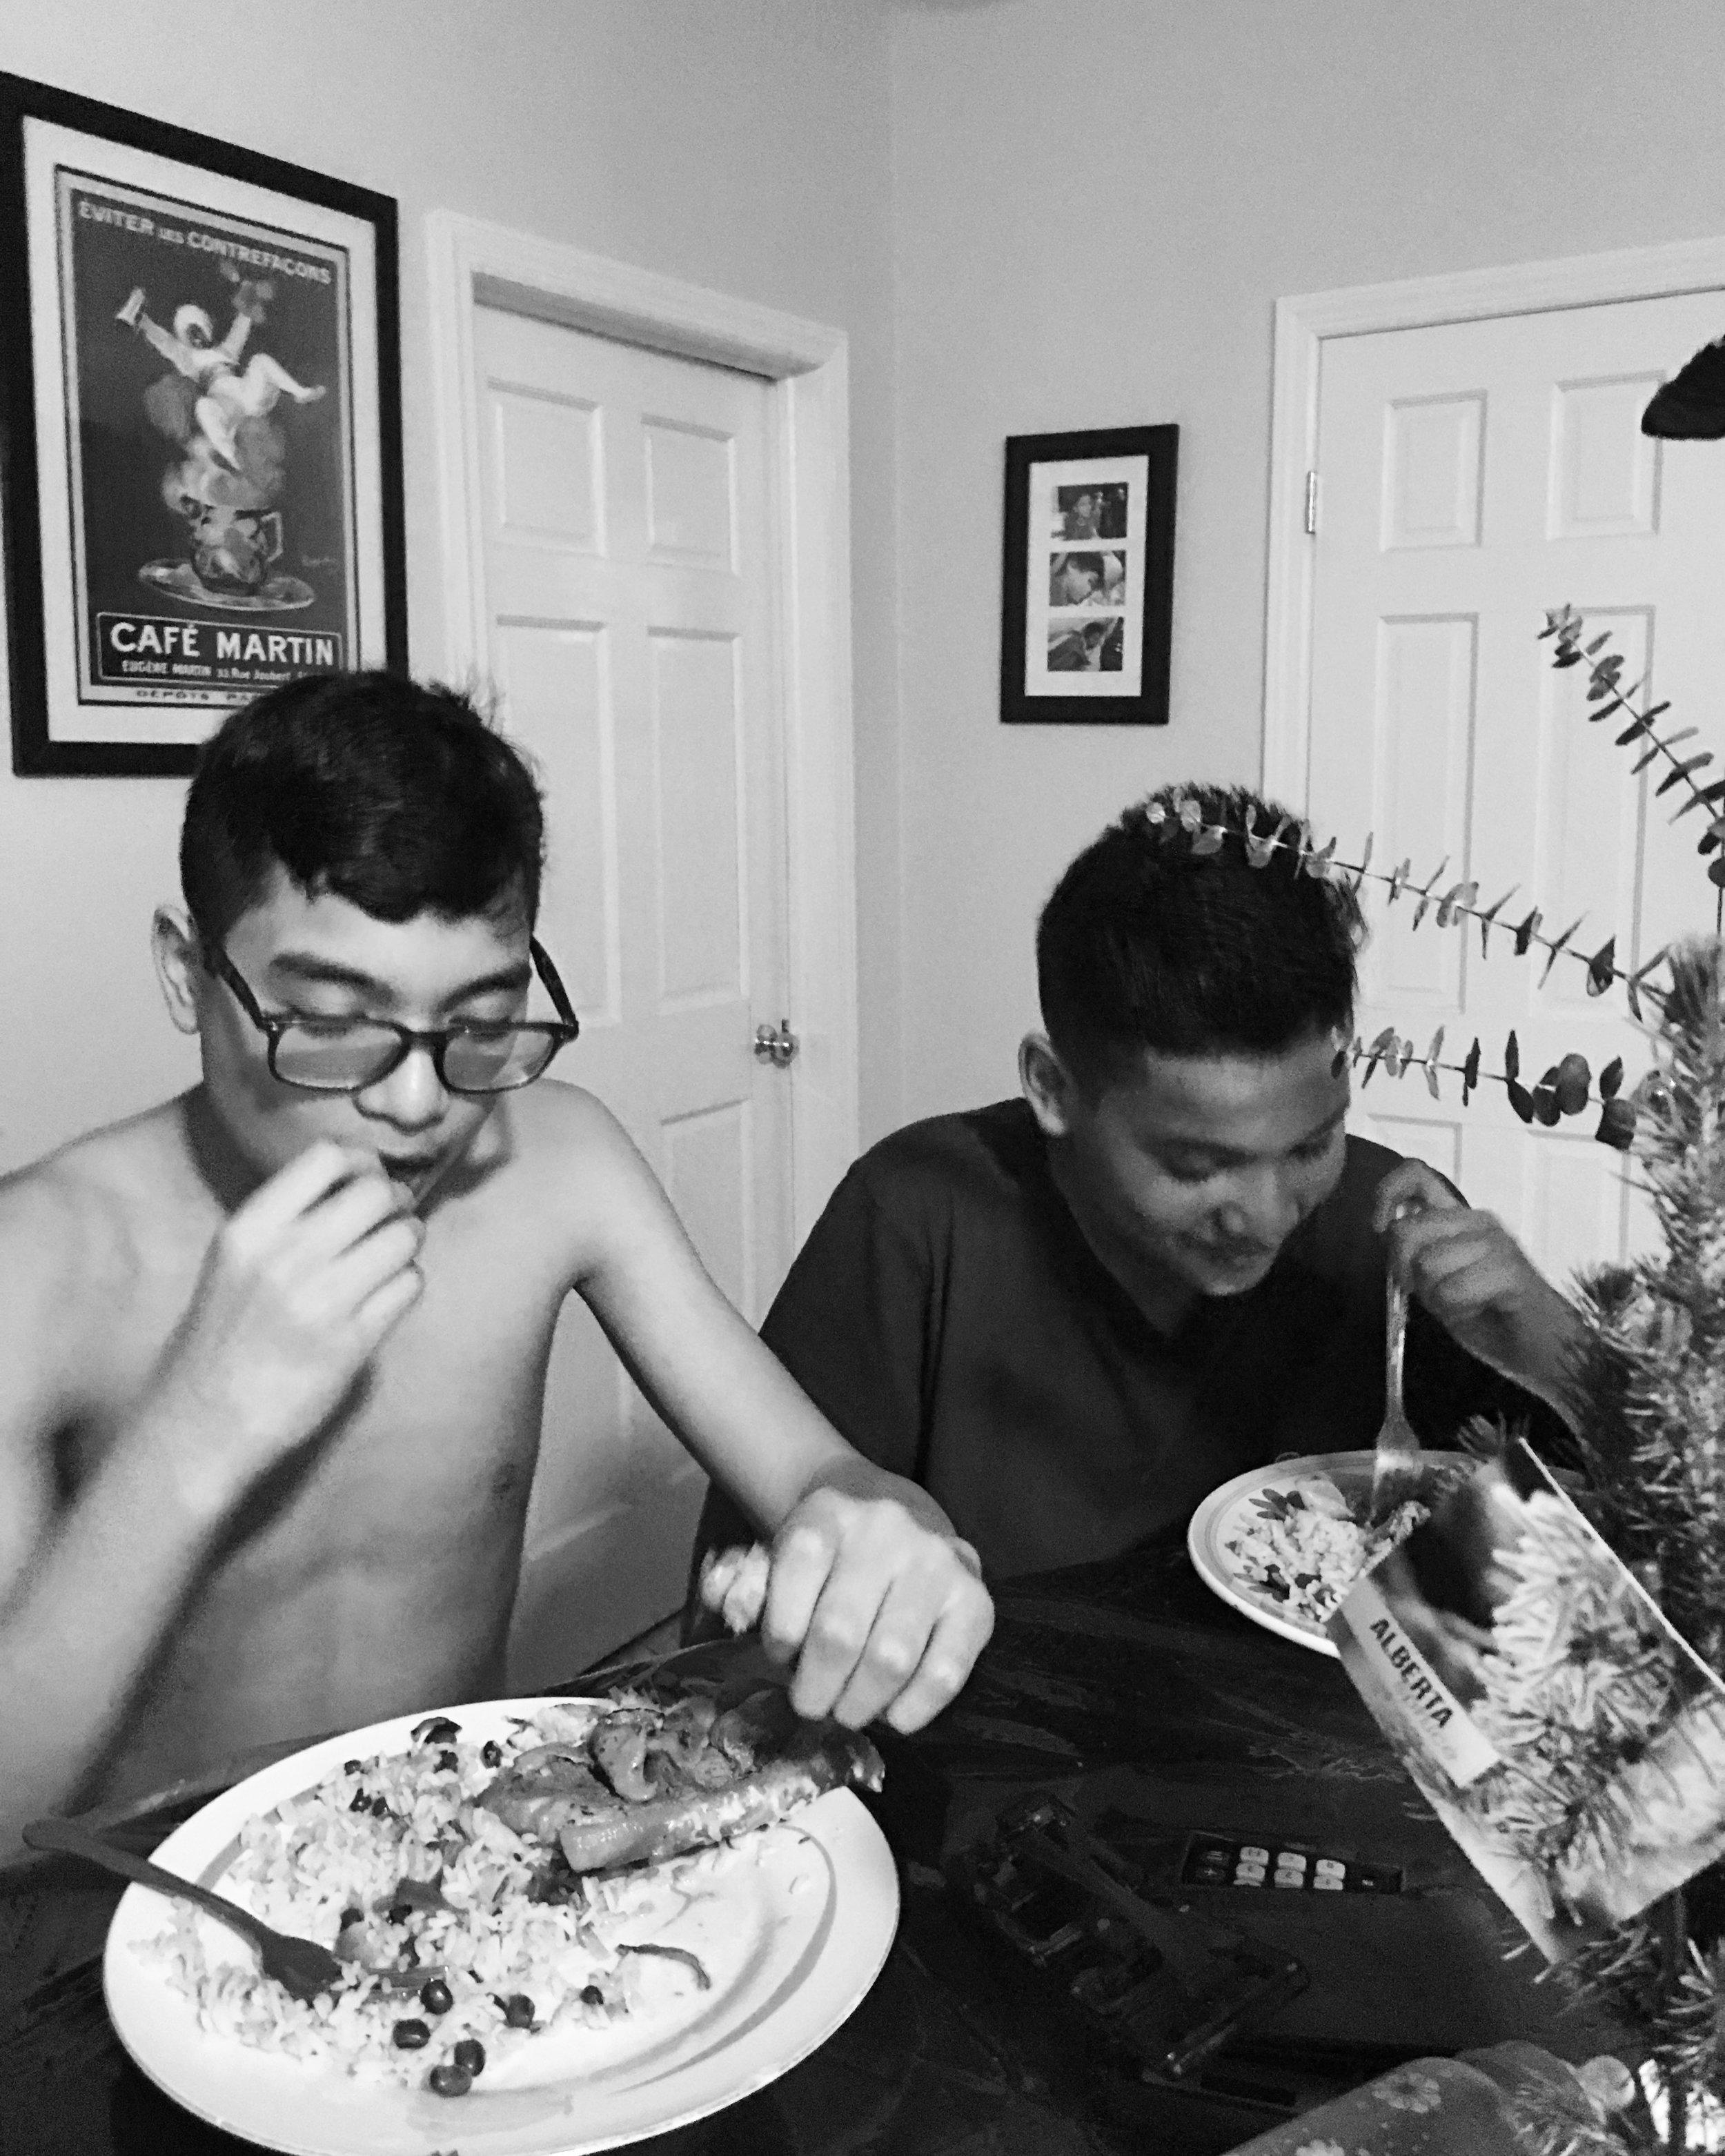 Roman and Saul Vazquez enjoying New Years Eve Dinner.